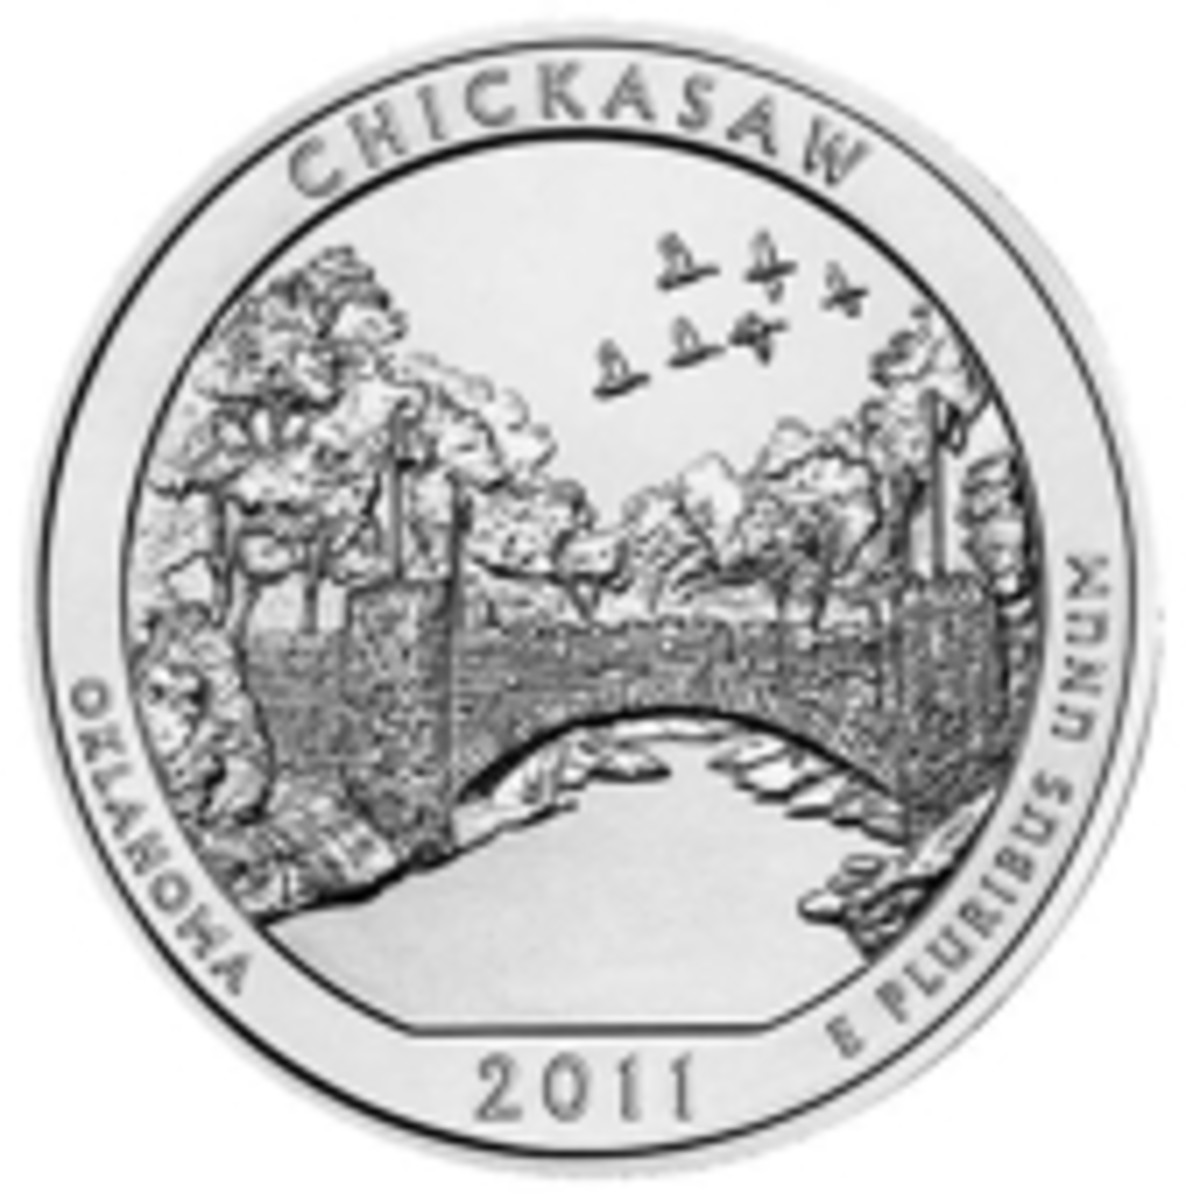 chickasaw170